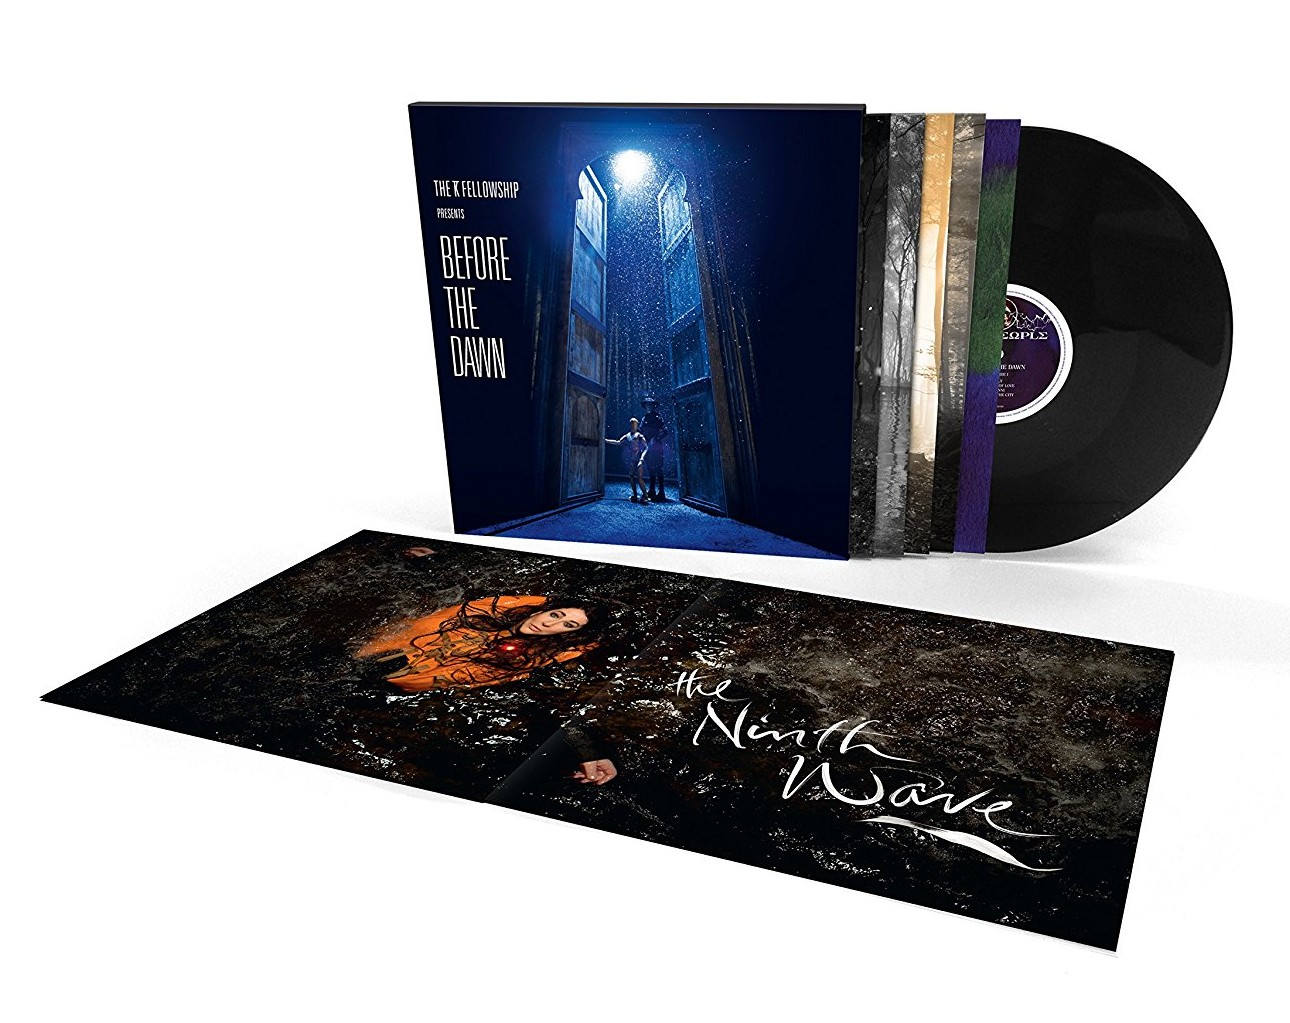 Kate Bush / Before The Dawn 4LP vinyl